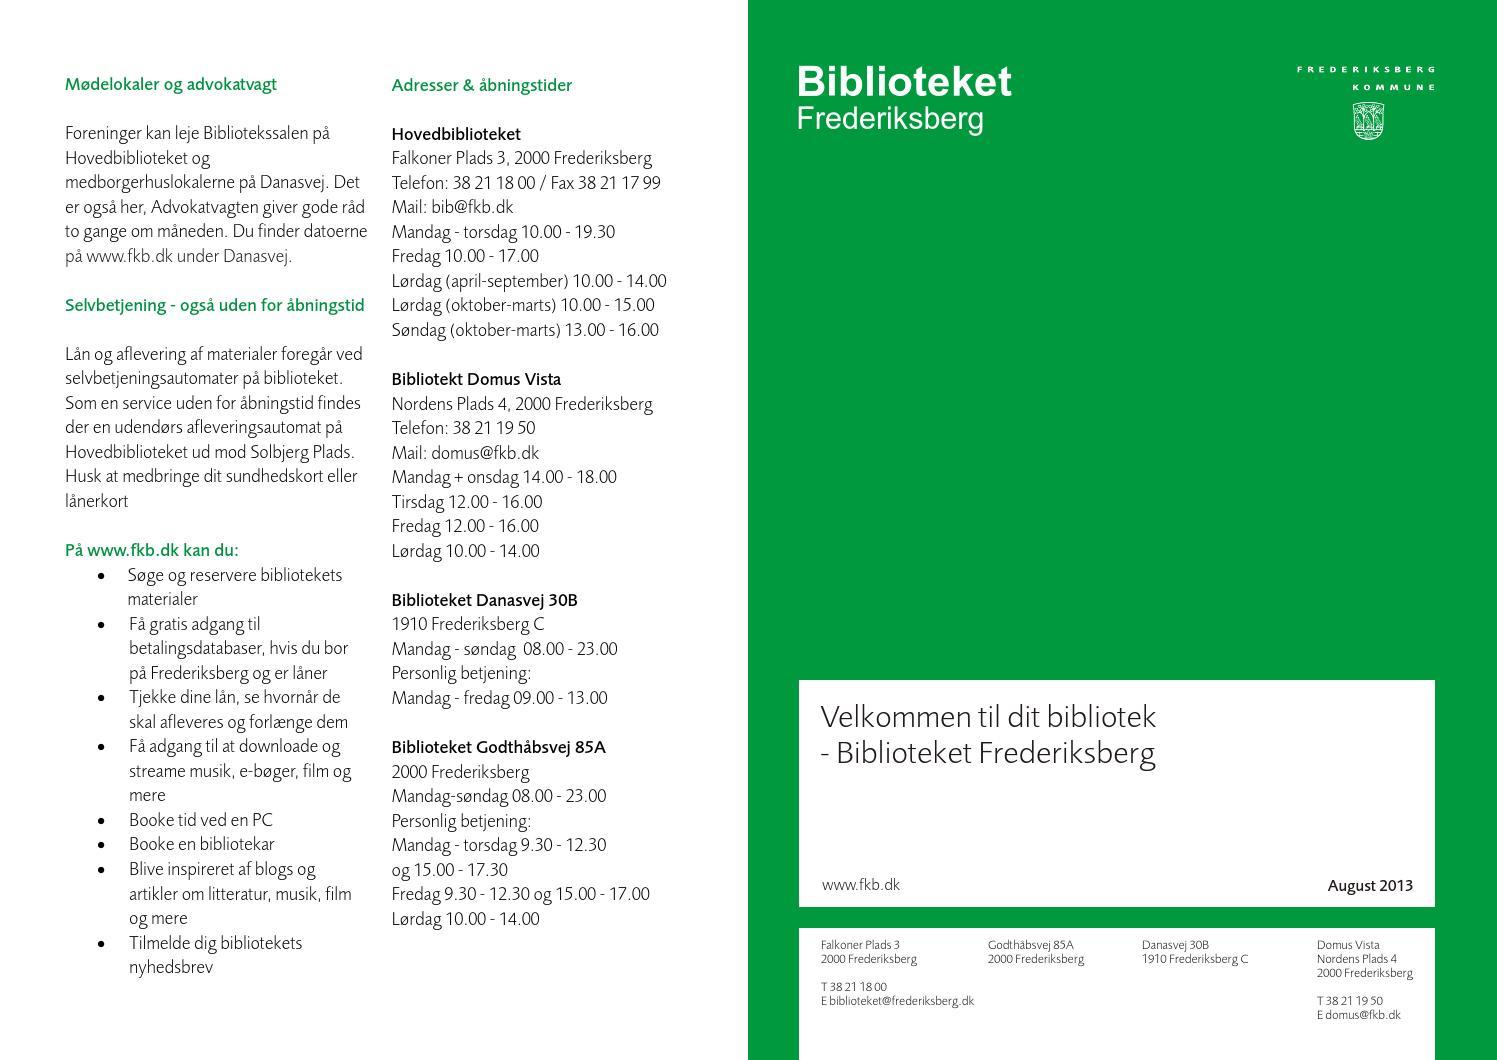 Velkommen Til Biblioteket Frederiksberg By Frederiksberg Bibliotek